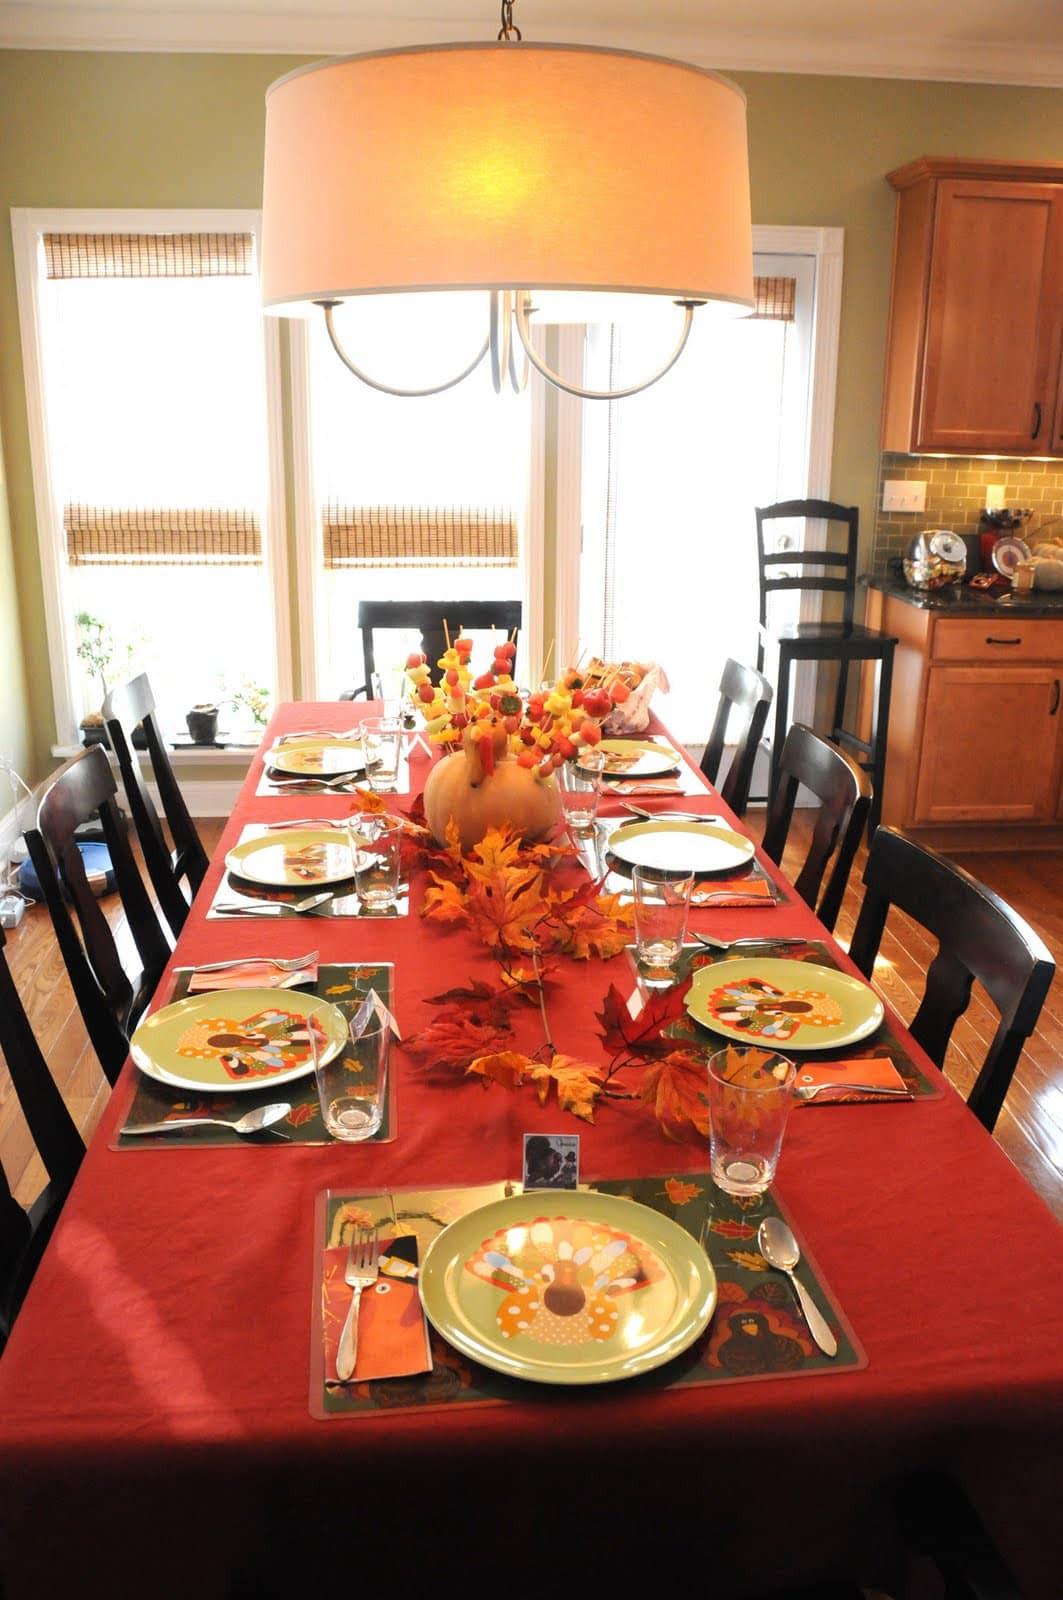 Thanksgiving Table Decor Ideas  Thanksgiving Decor The Polkadot Chair